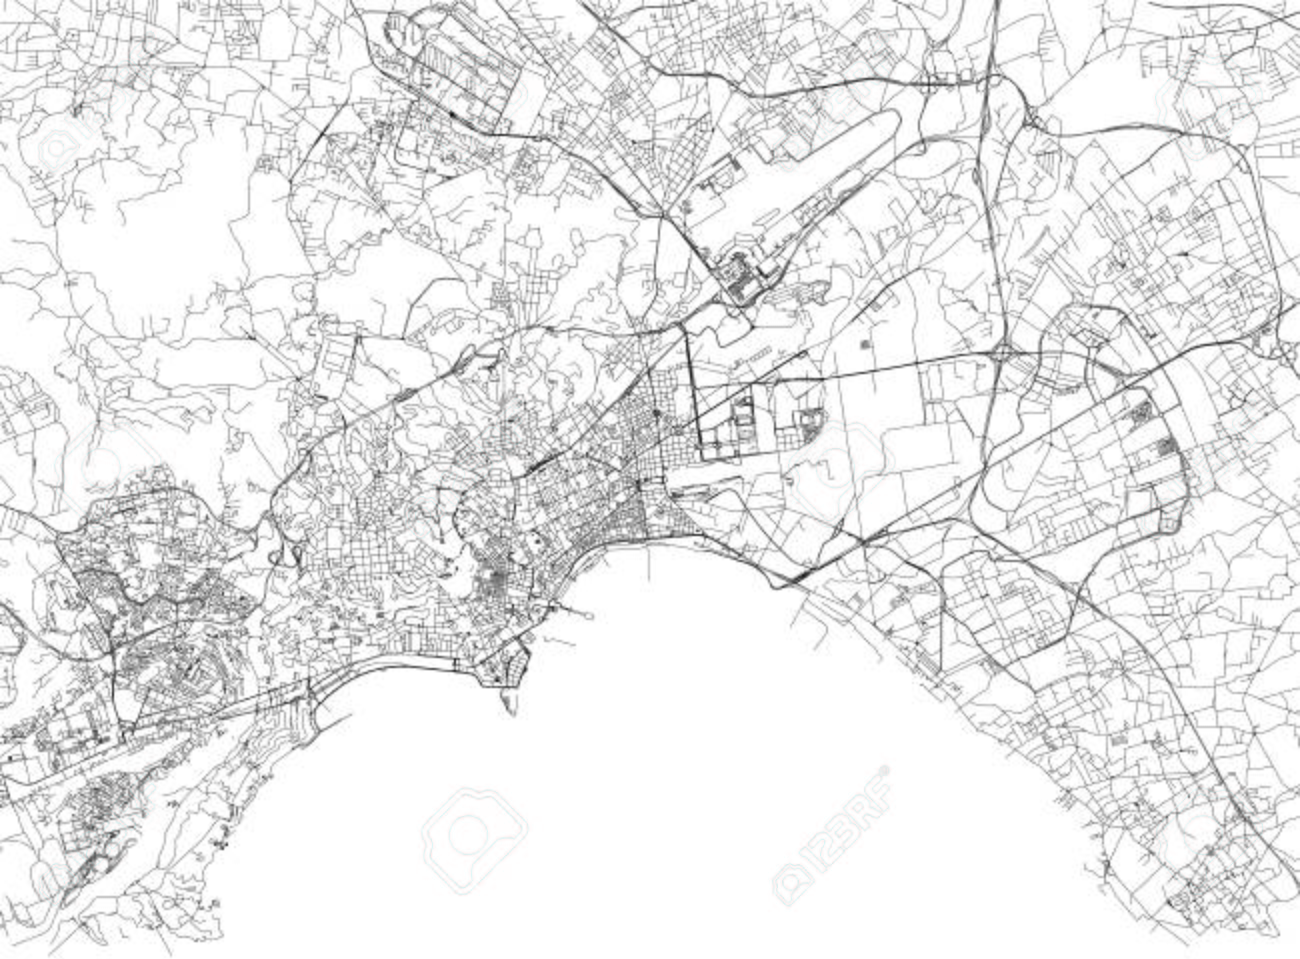 Streets of naples city map campania italy street map royalty streets of naples city map campania italy street map stock vector altavistaventures Choice Image